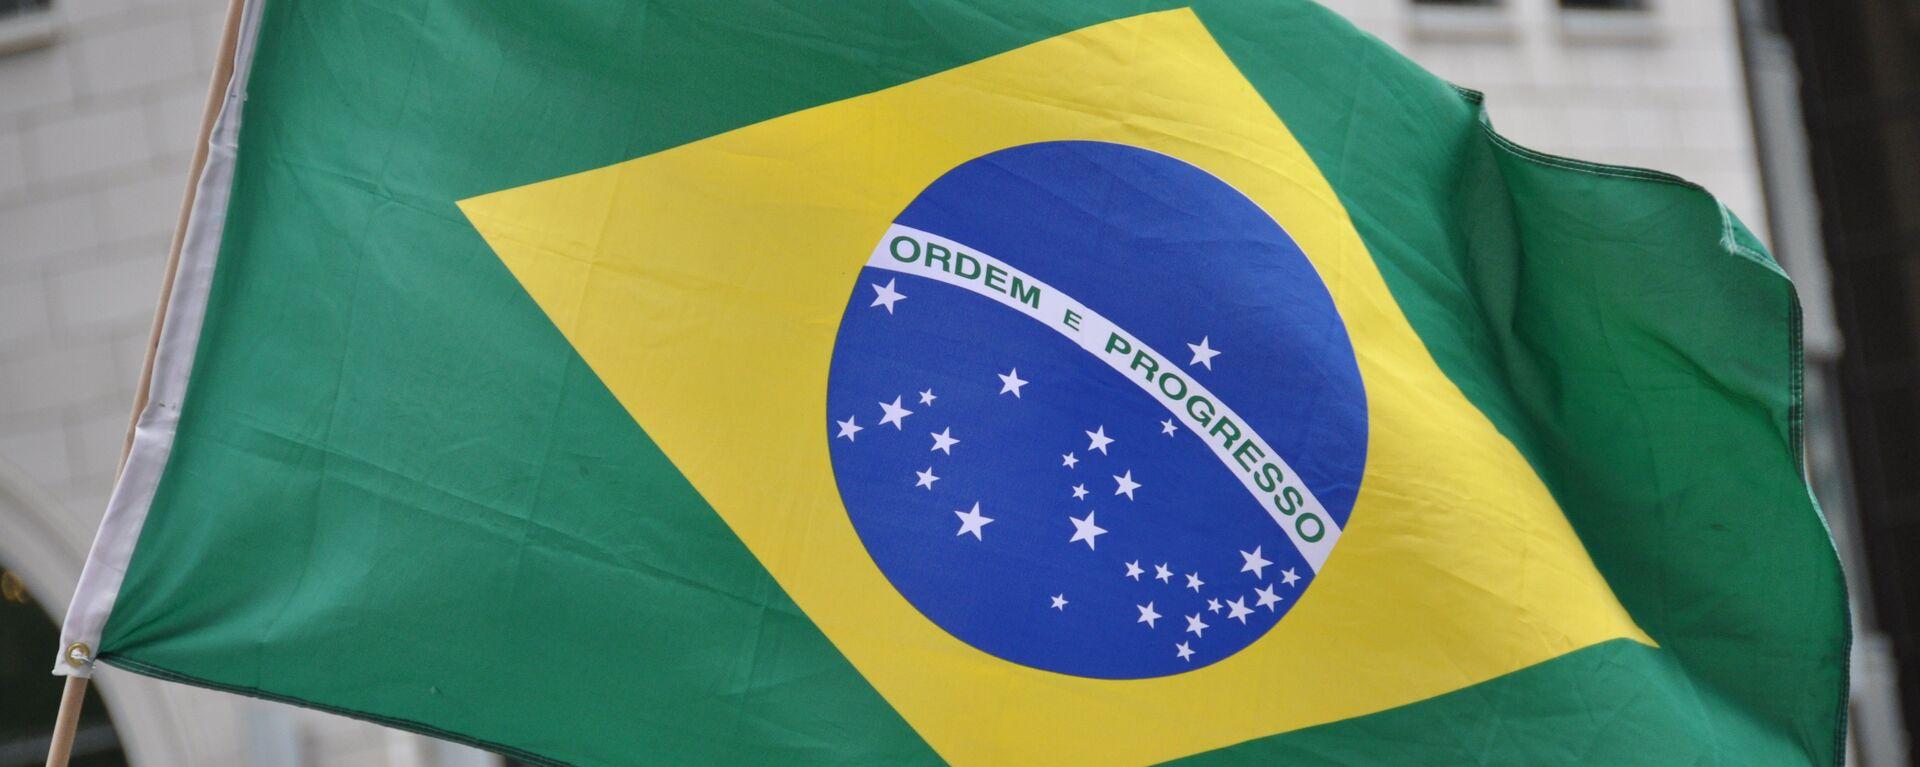 Bandera de Brasil - Sputnik Mundo, 1920, 10.06.2021